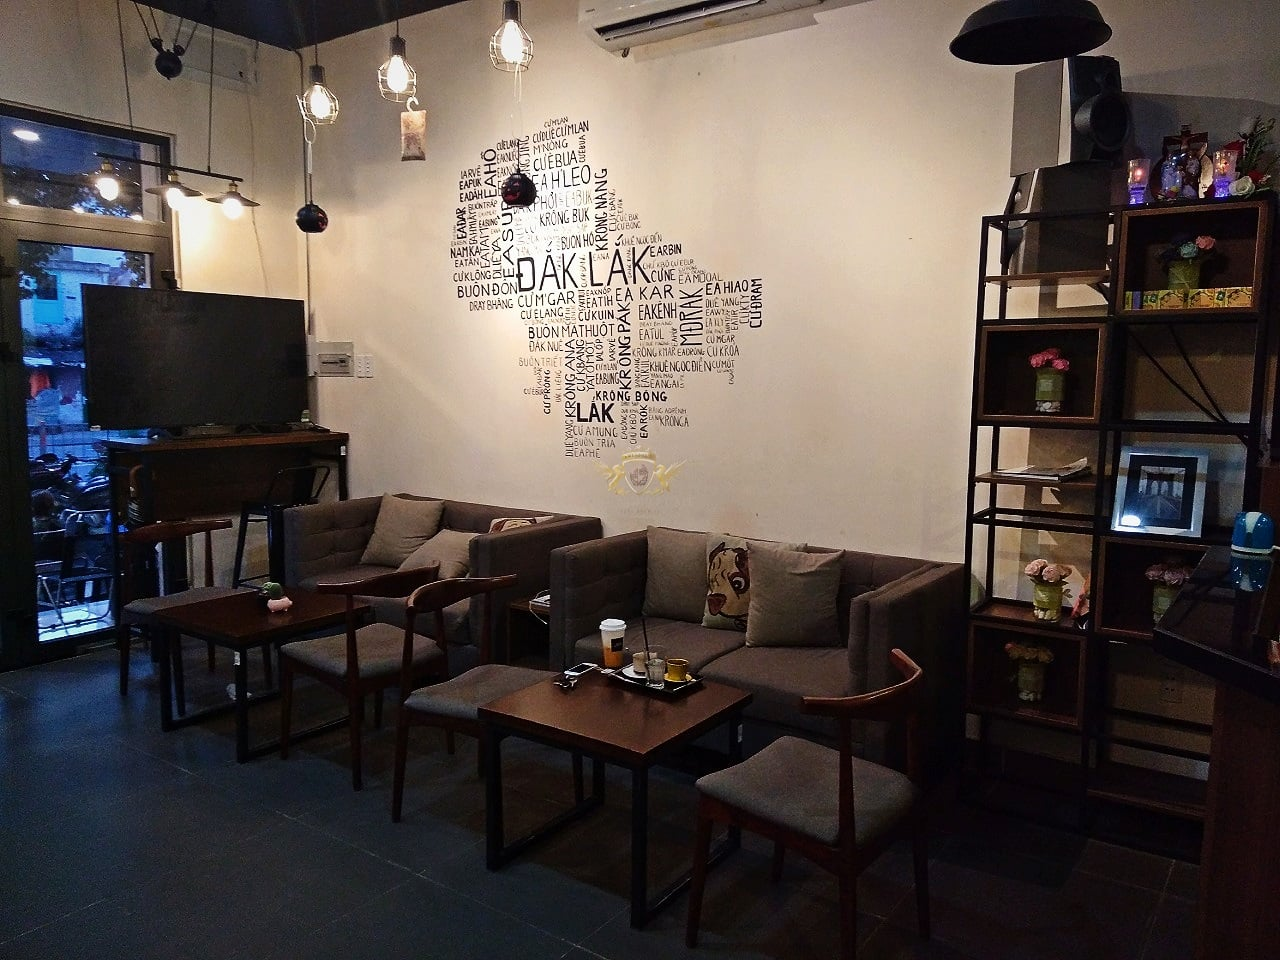 Dom Cafe Go Vap mua ban may pha cafe chuyen nghiep cua y Faema E98 RE A2 HC600 khoi nghiep cafe 20